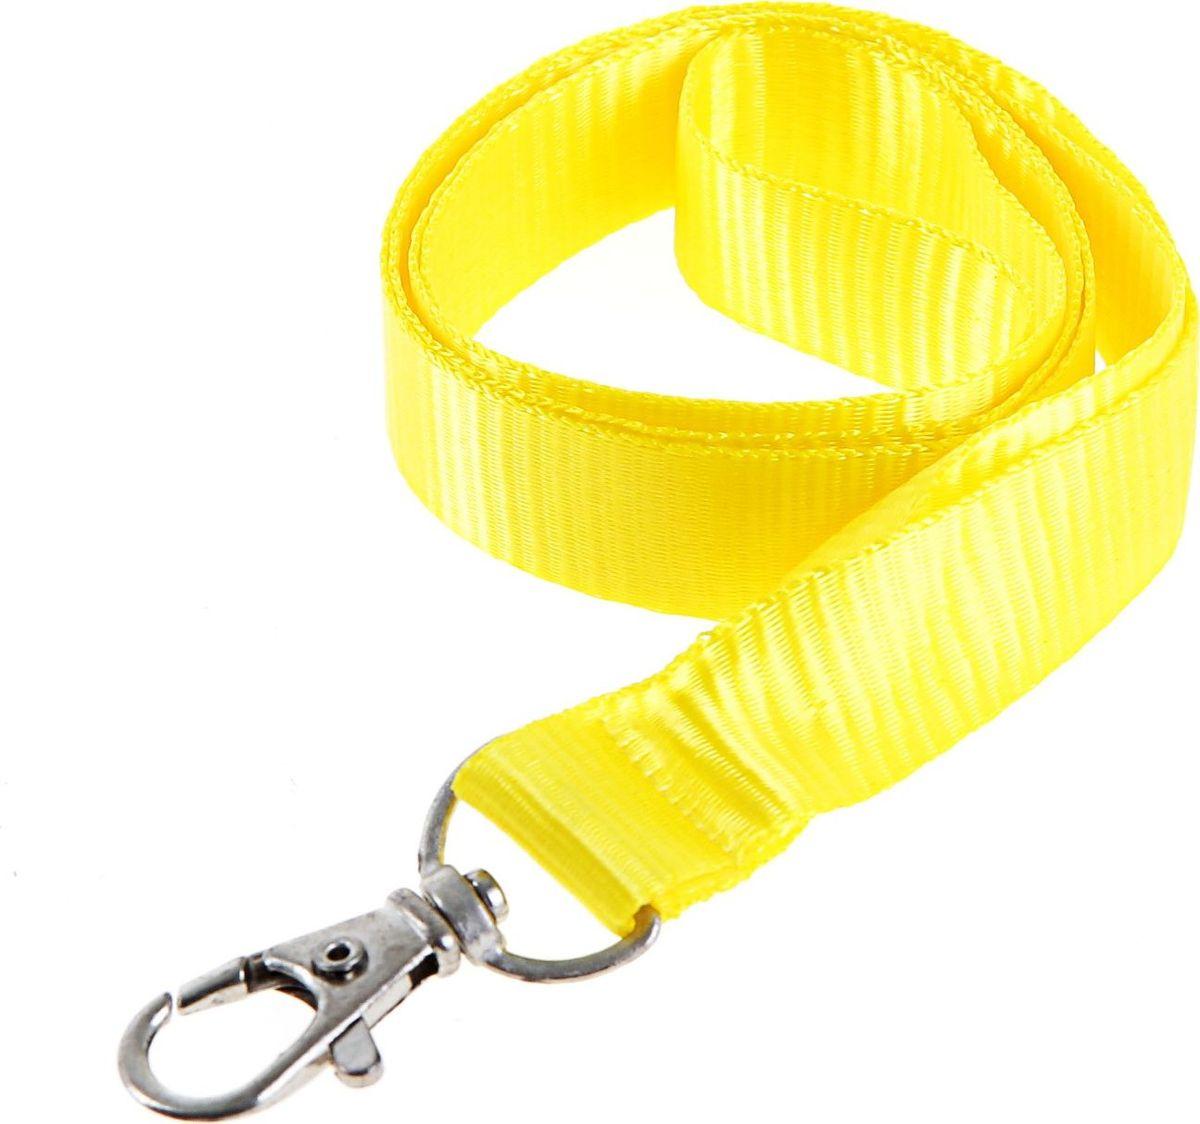 Лента для бейджа длина 80 см ширина 15 мм цвет желтый593868